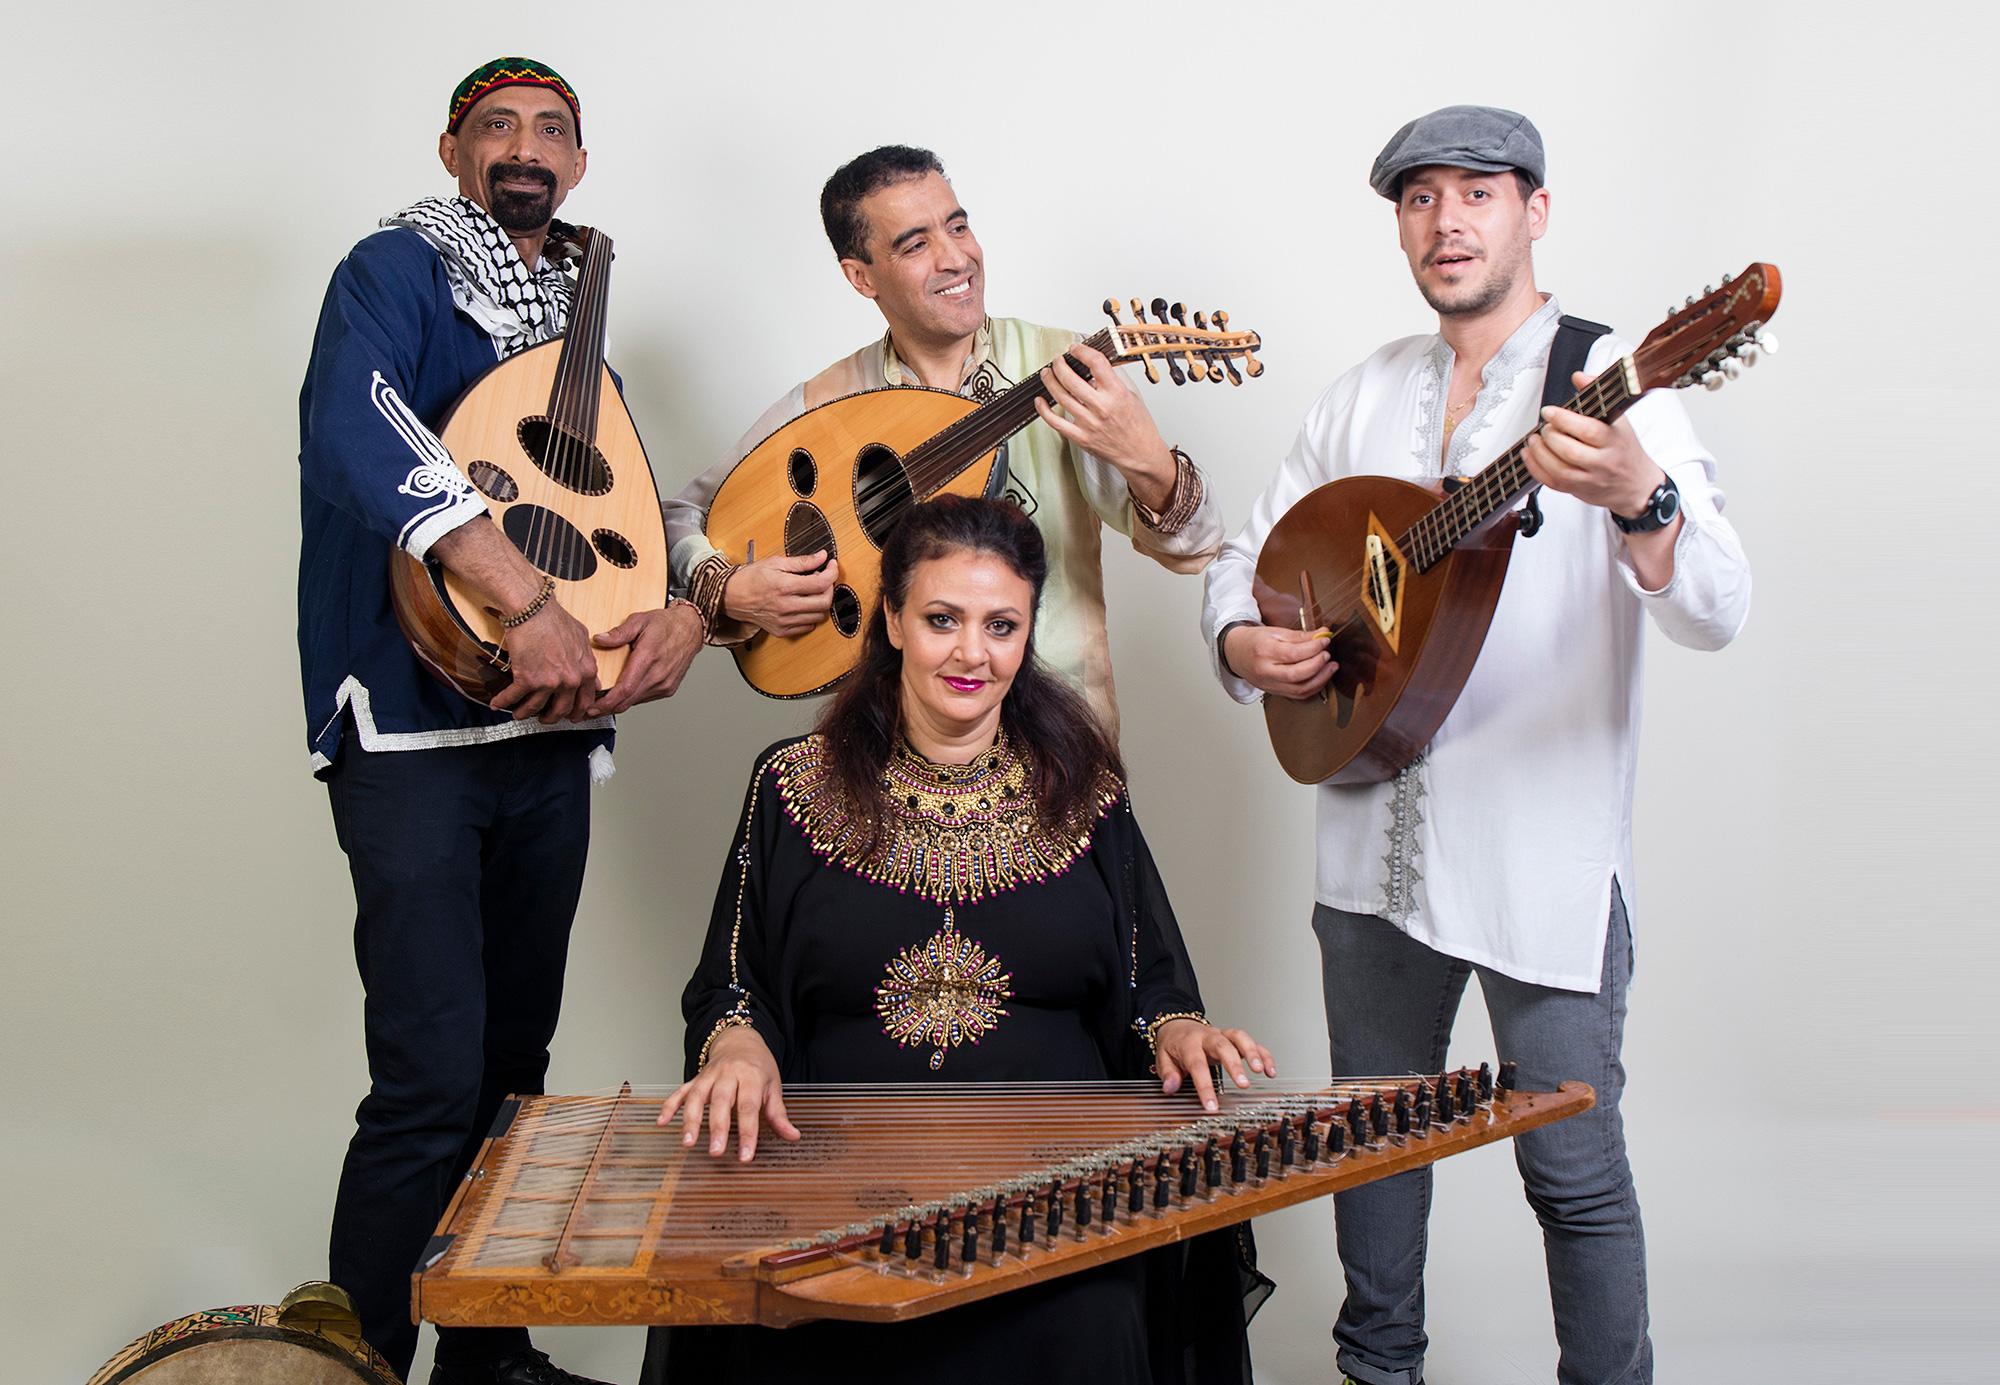 batuki music society toronto ontario canada africa african art culture artists nadine mcnulty otimoi oyemu habari concert maghreb